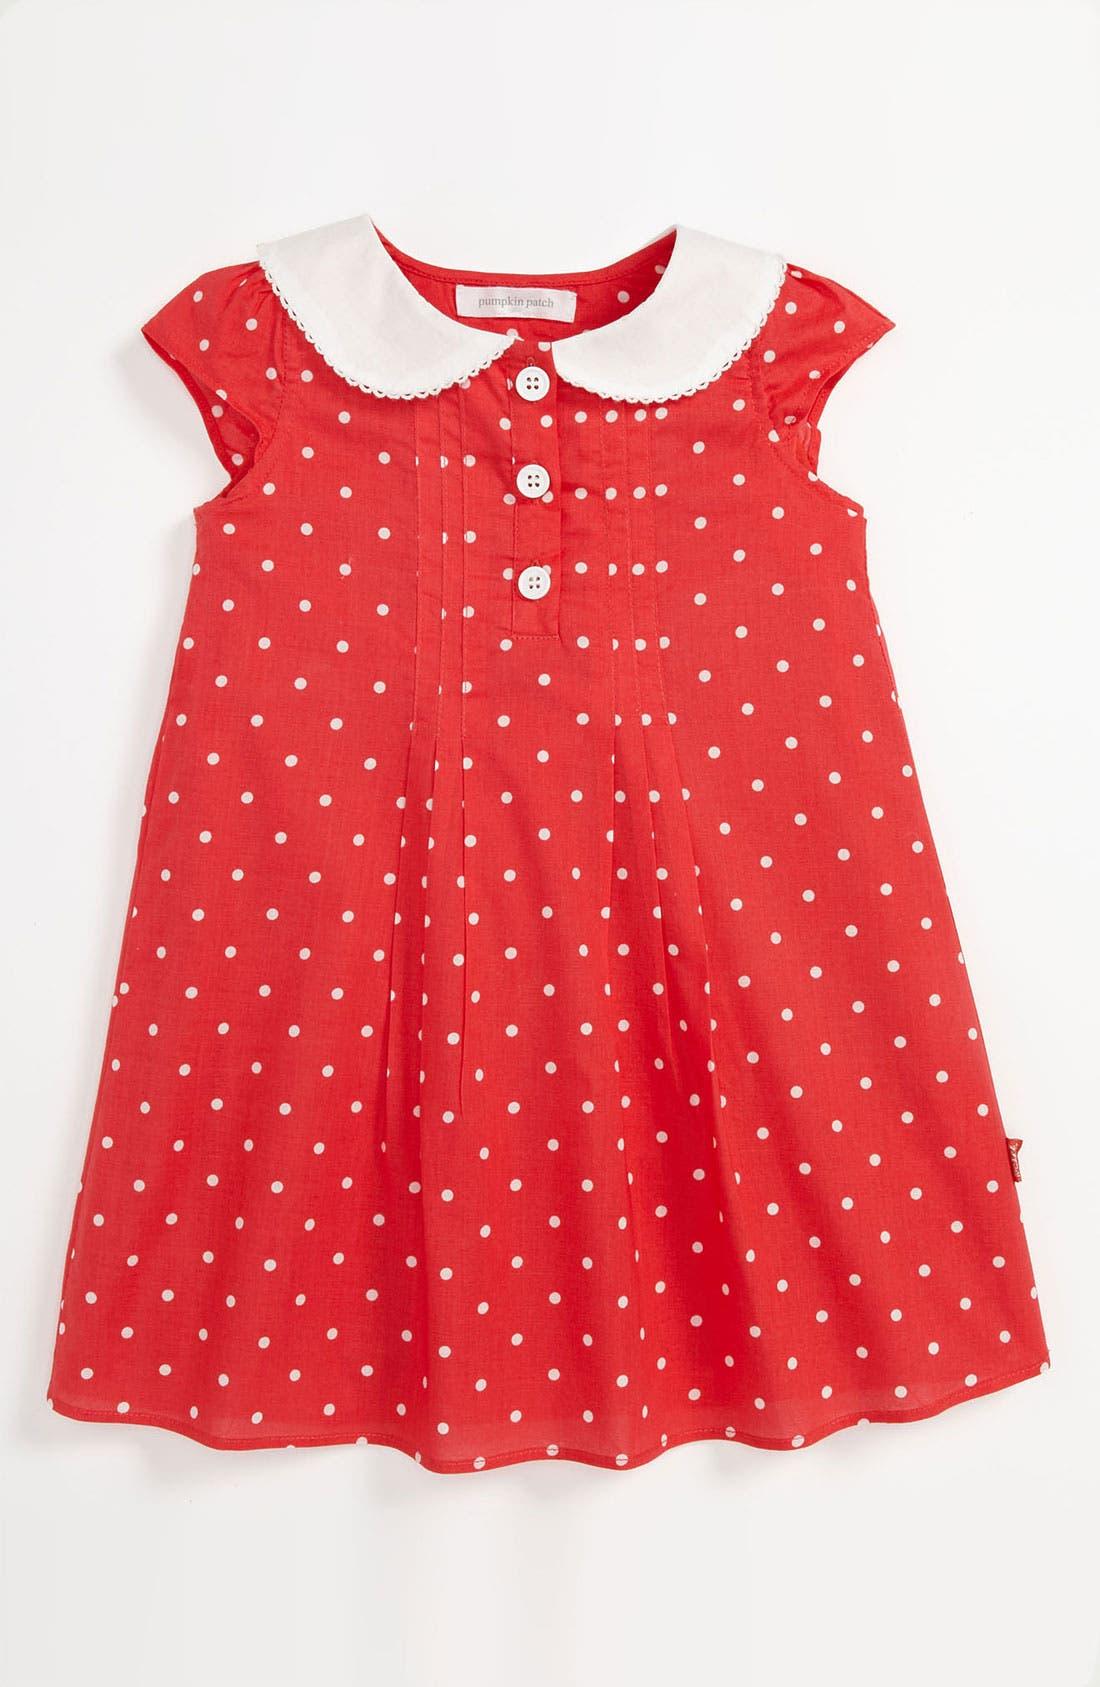 Alternate Image 1 Selected - Pumpkin Patch 'Alexa' Dress (Toddler)